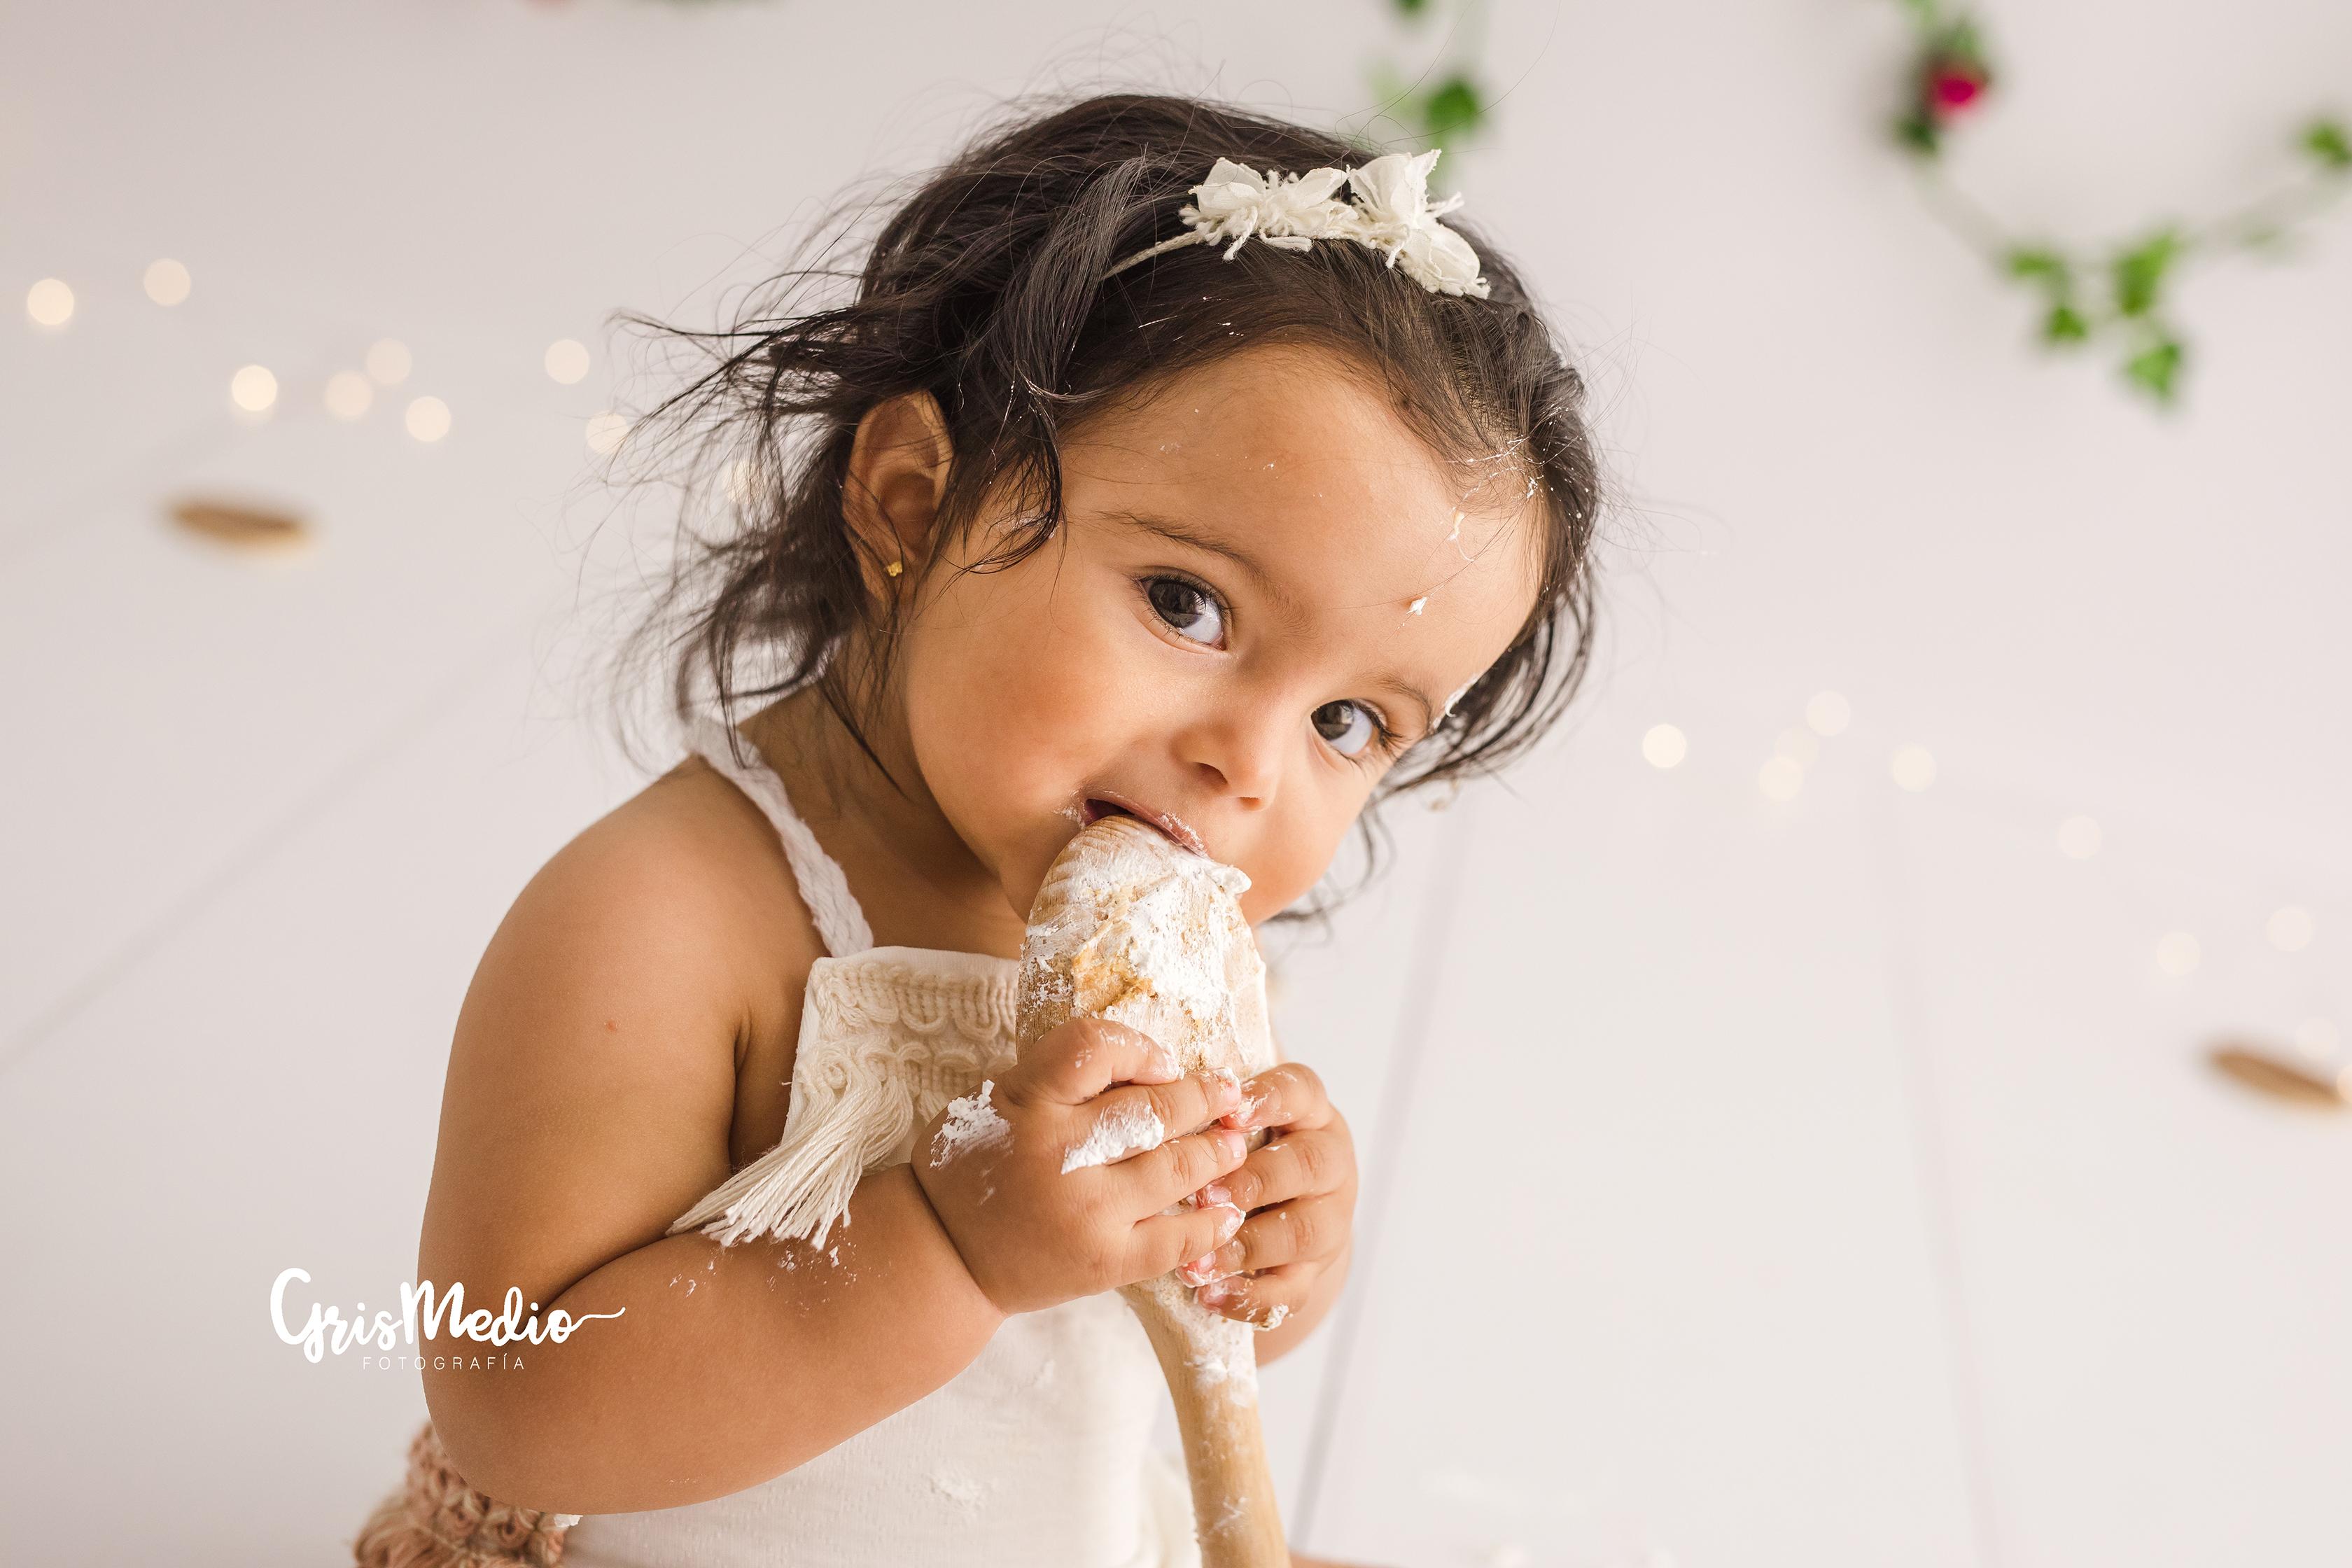 Grismedio_Fotografia-2_smash_cake,_primer cumpelaños 1 año